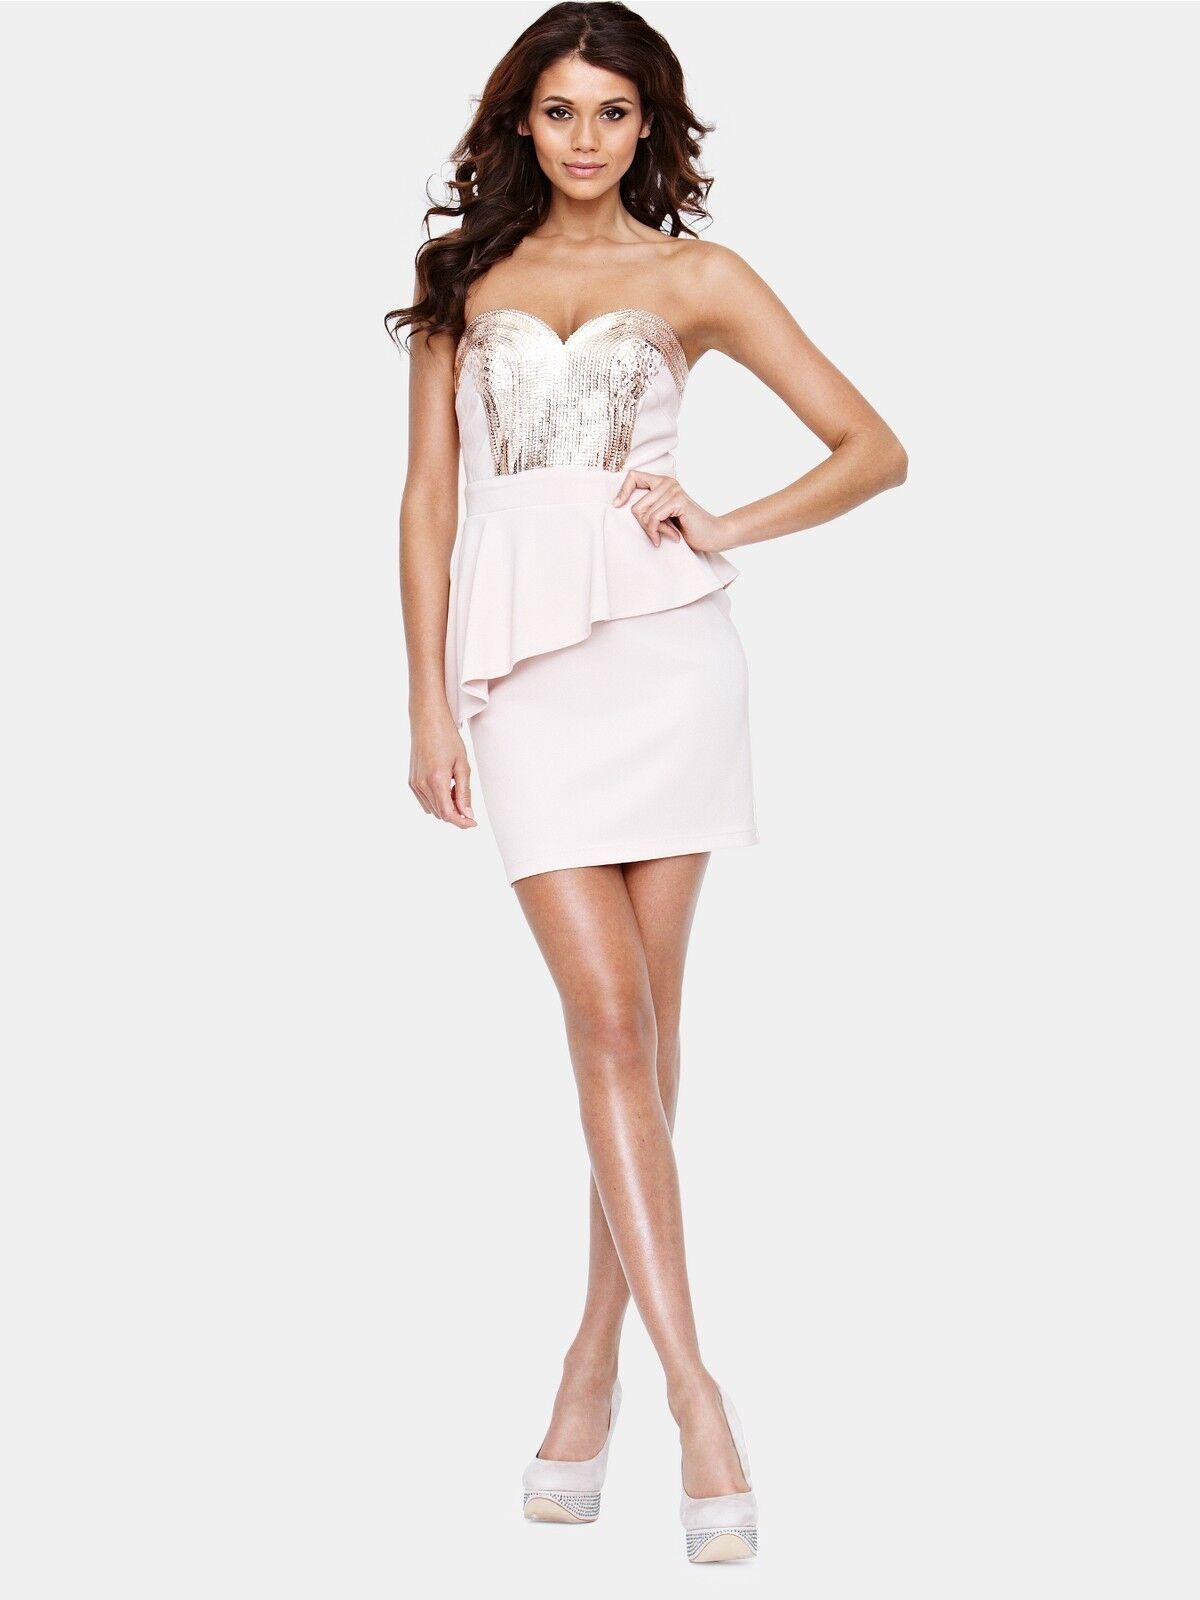 LIPSY Embellished Bustier Peplum Dress  Size 10 RRP  (DEFECT)